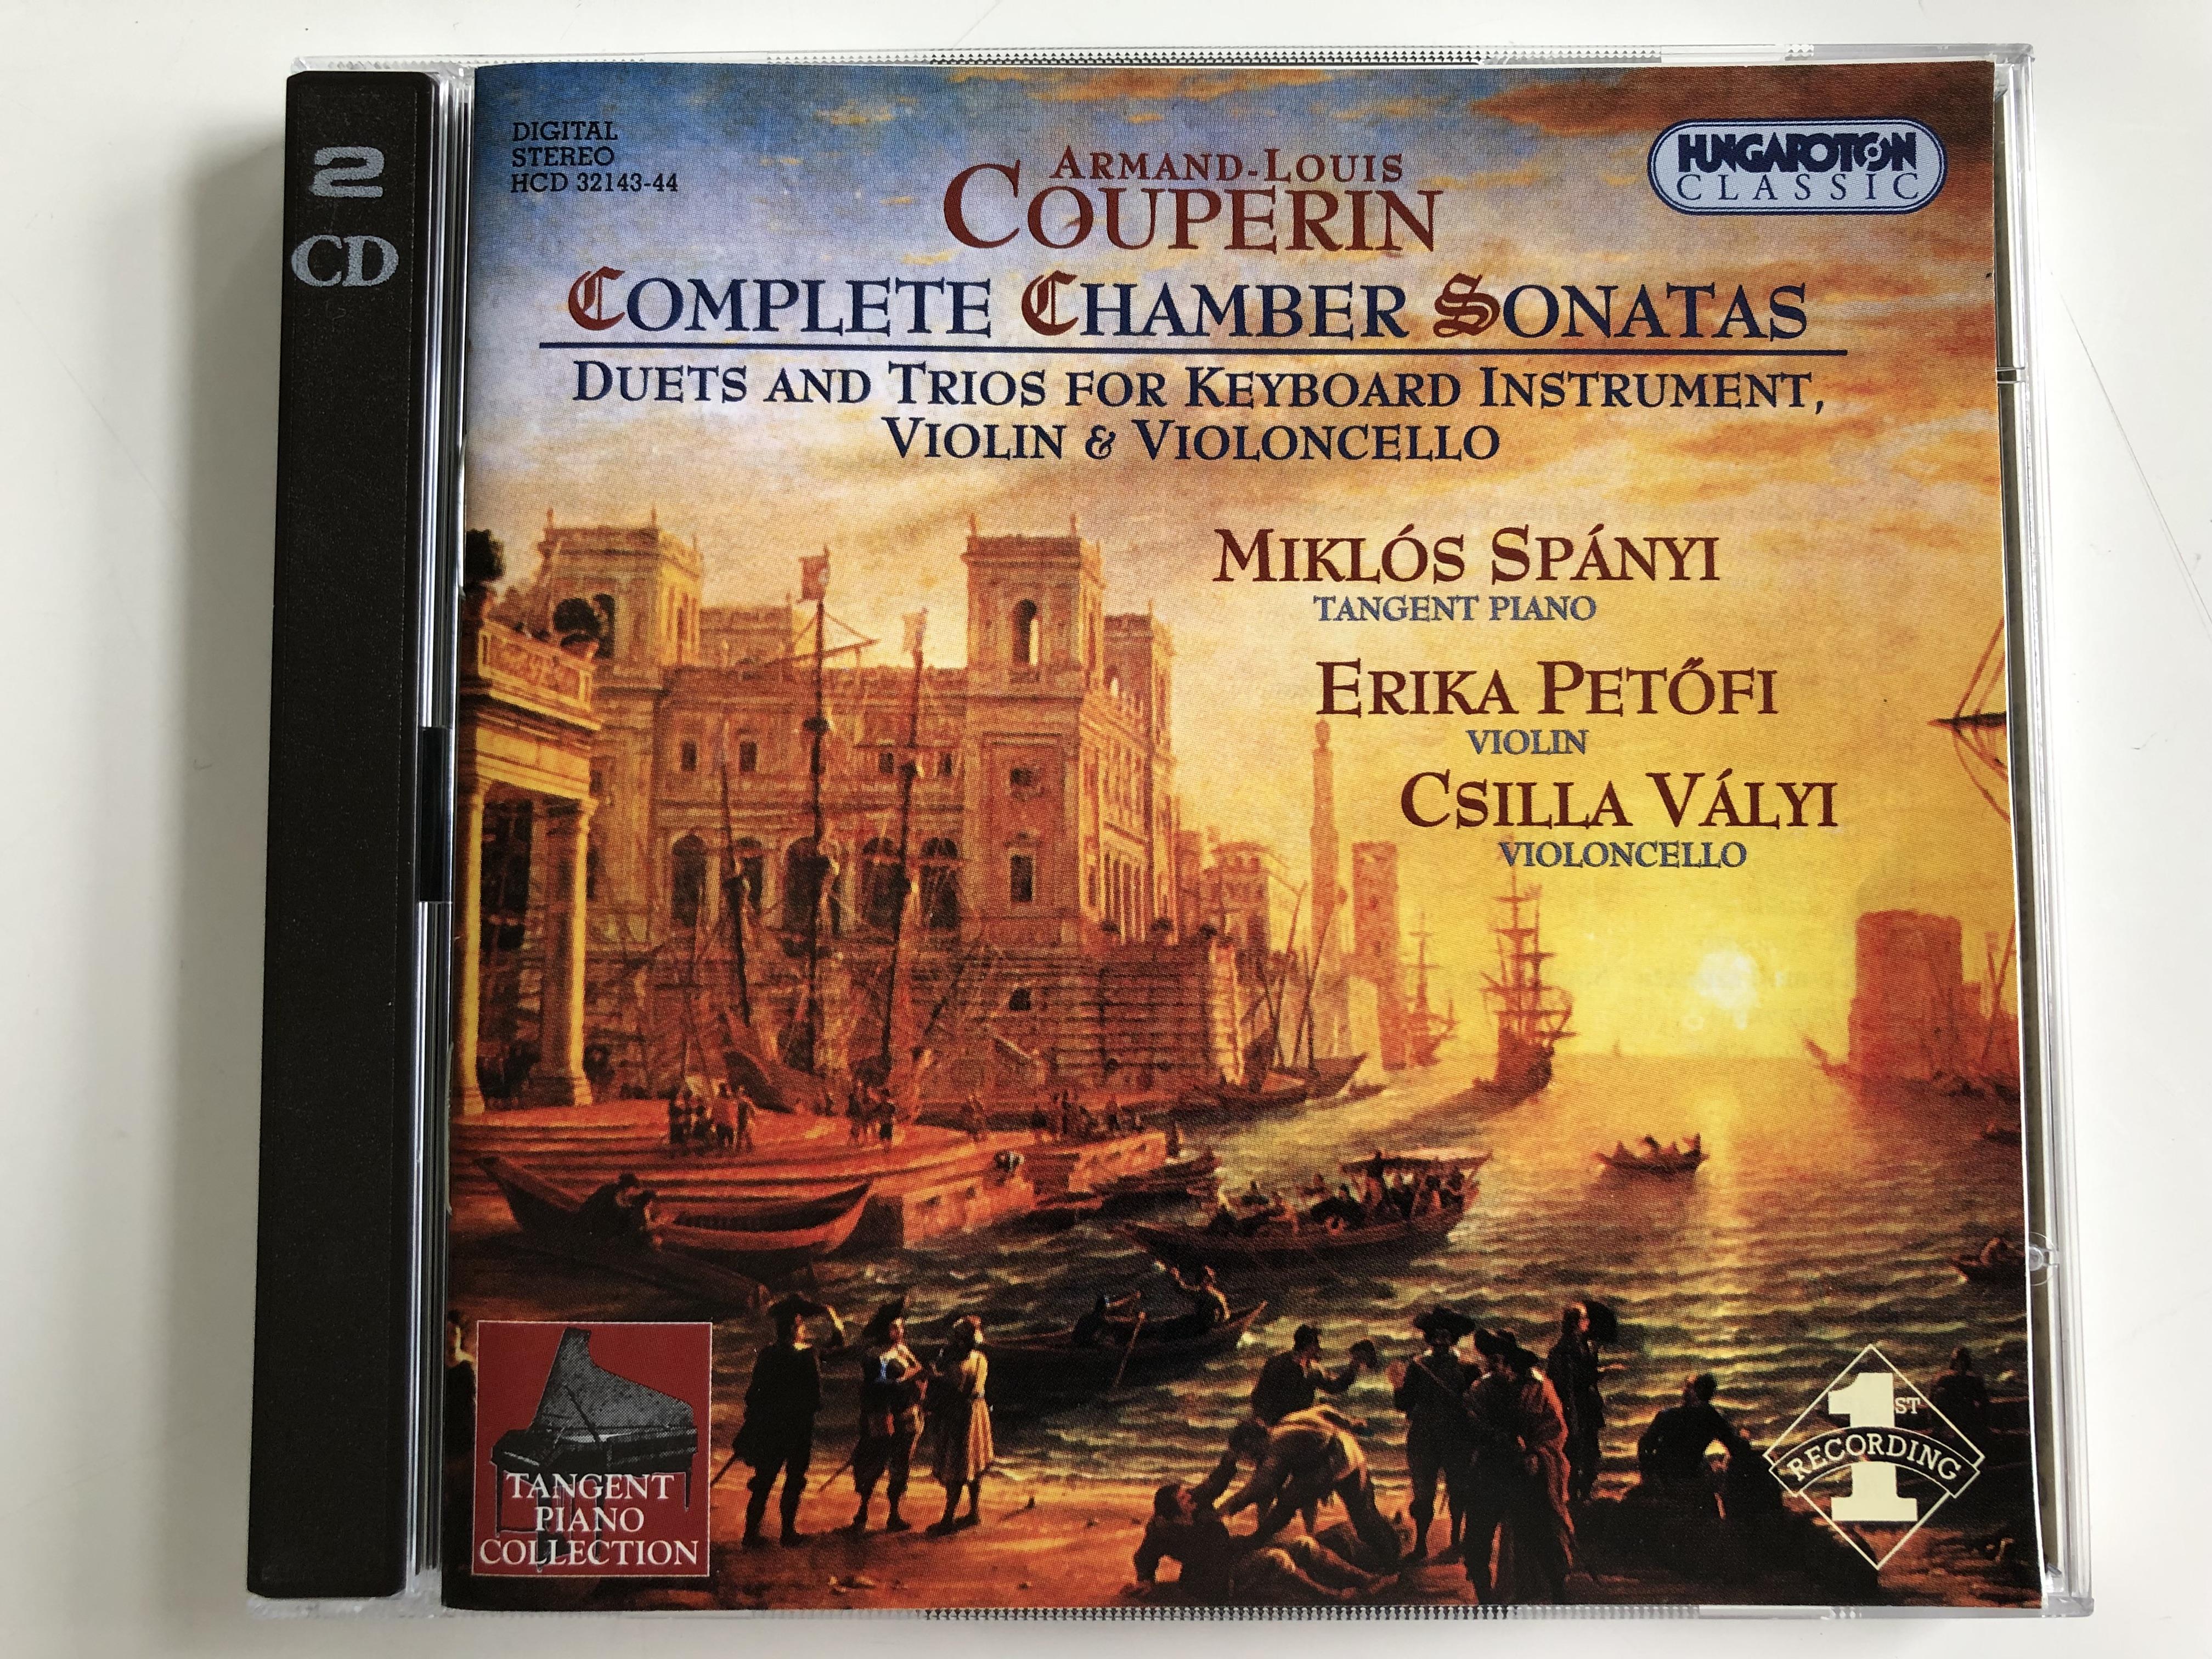 armand-louis-couperin-complete-chamber-sonatas-duets-and-trios-for-keyboard-instrument-violin-violoncello-tangent-piano-miklos-spanyi-violin-erika-petofi-violoncello-csilla-valyi-hungar-1-.jpg